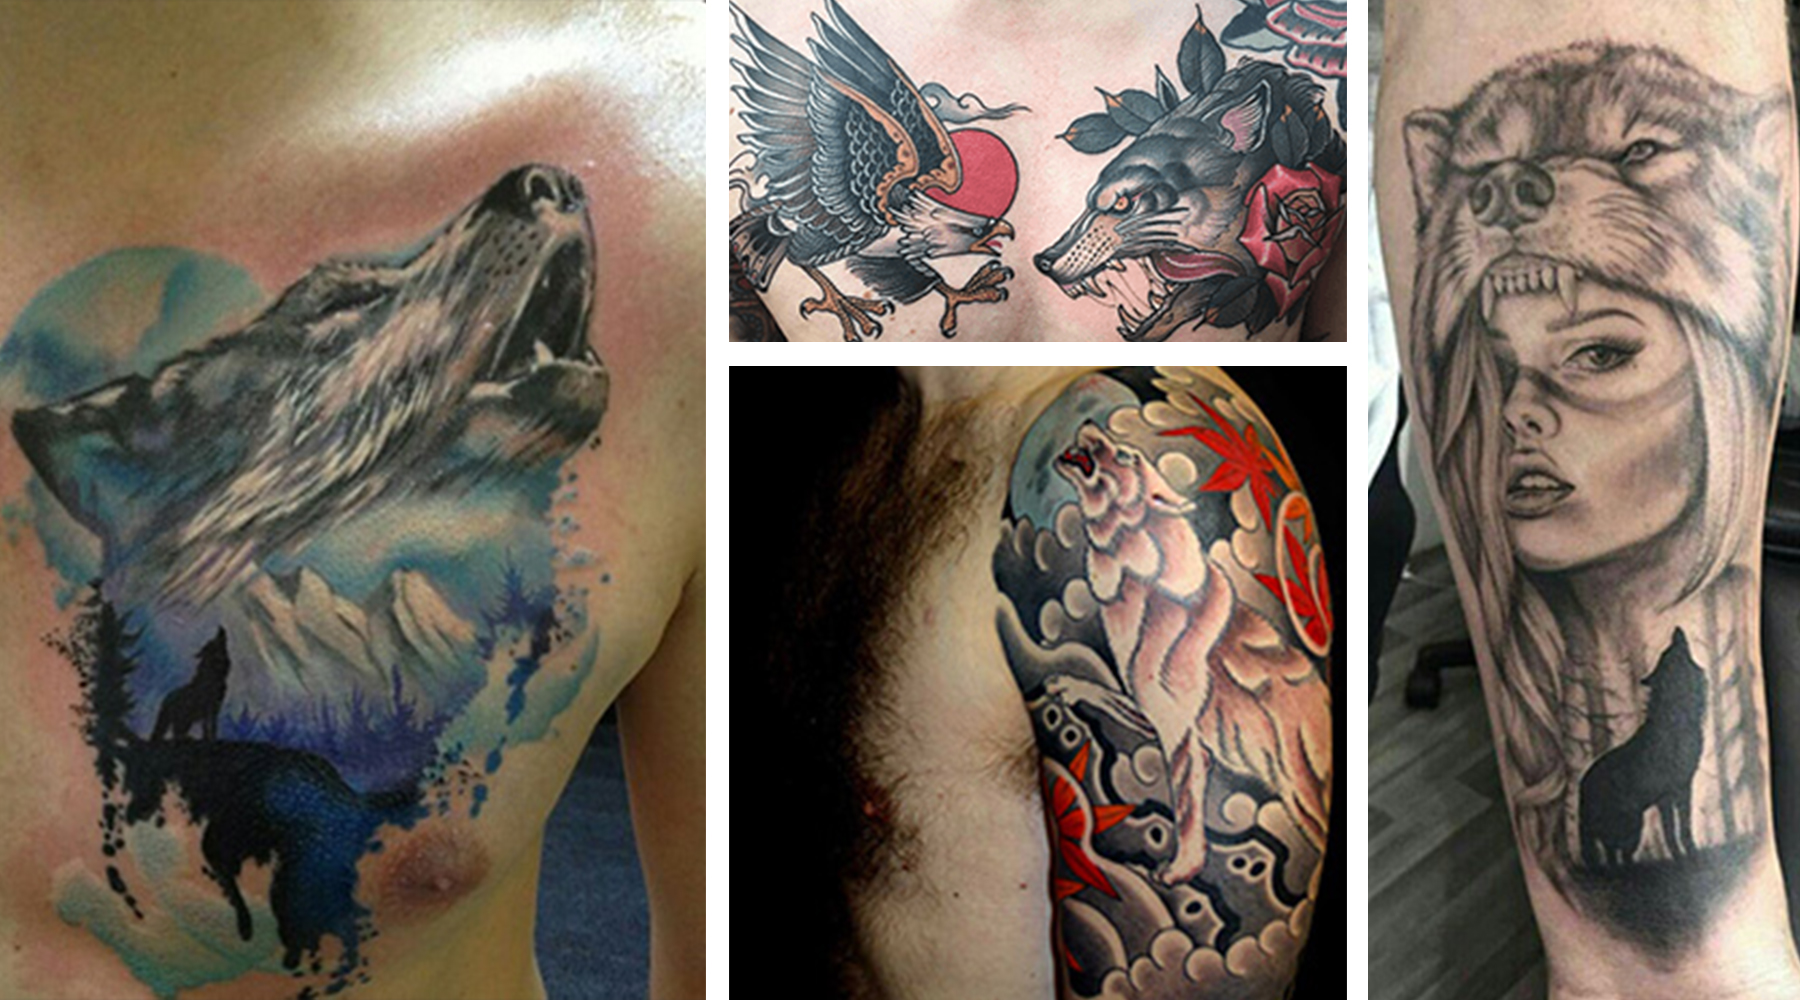 51 Deadliest Predator Tattoo Designs Ideas For Men: Wolves Tattoo Meanings